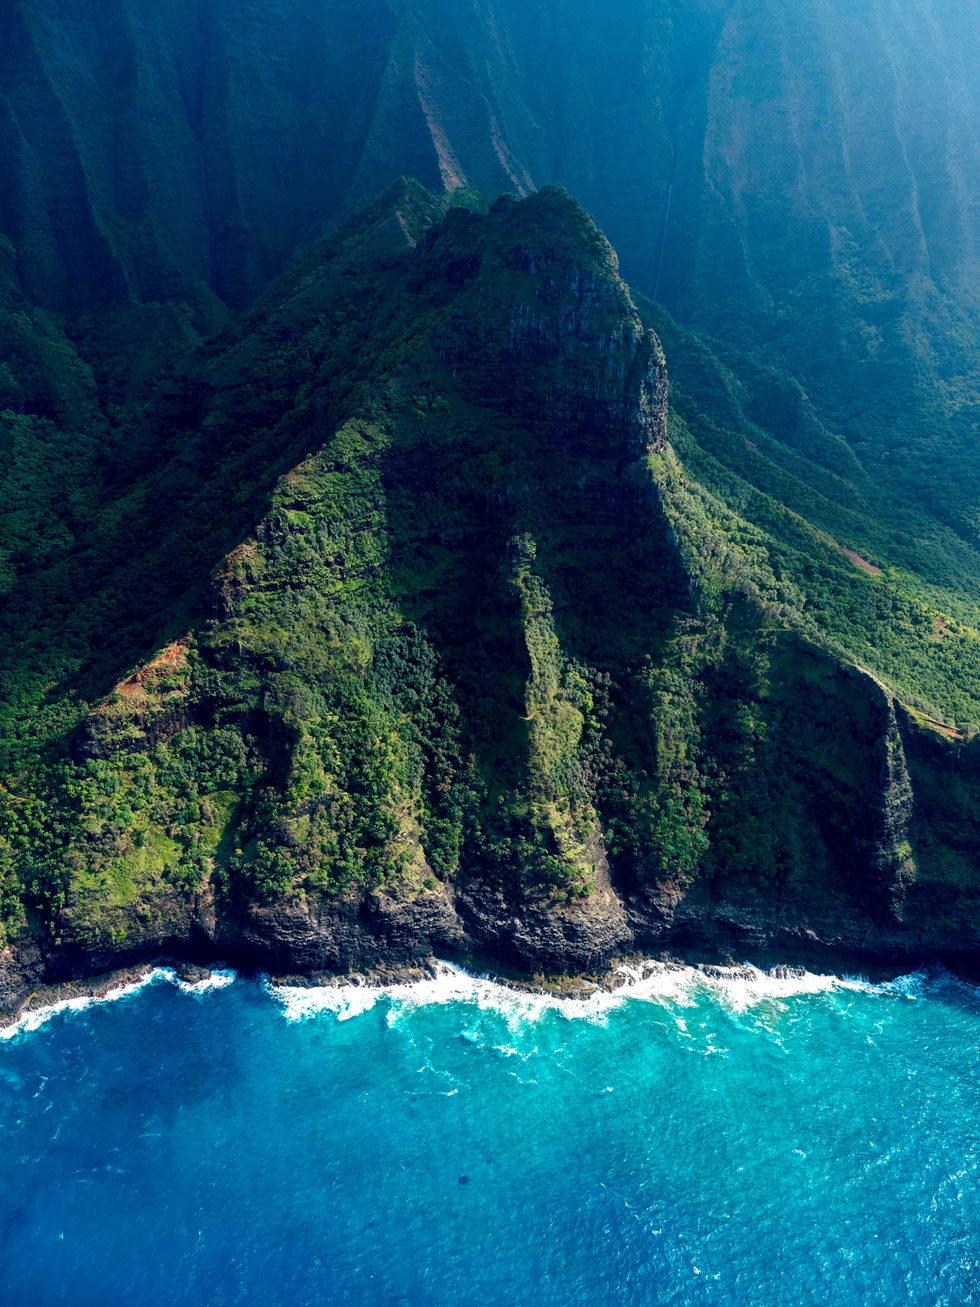 'My Rock' - Na Pali Coast, Kauai